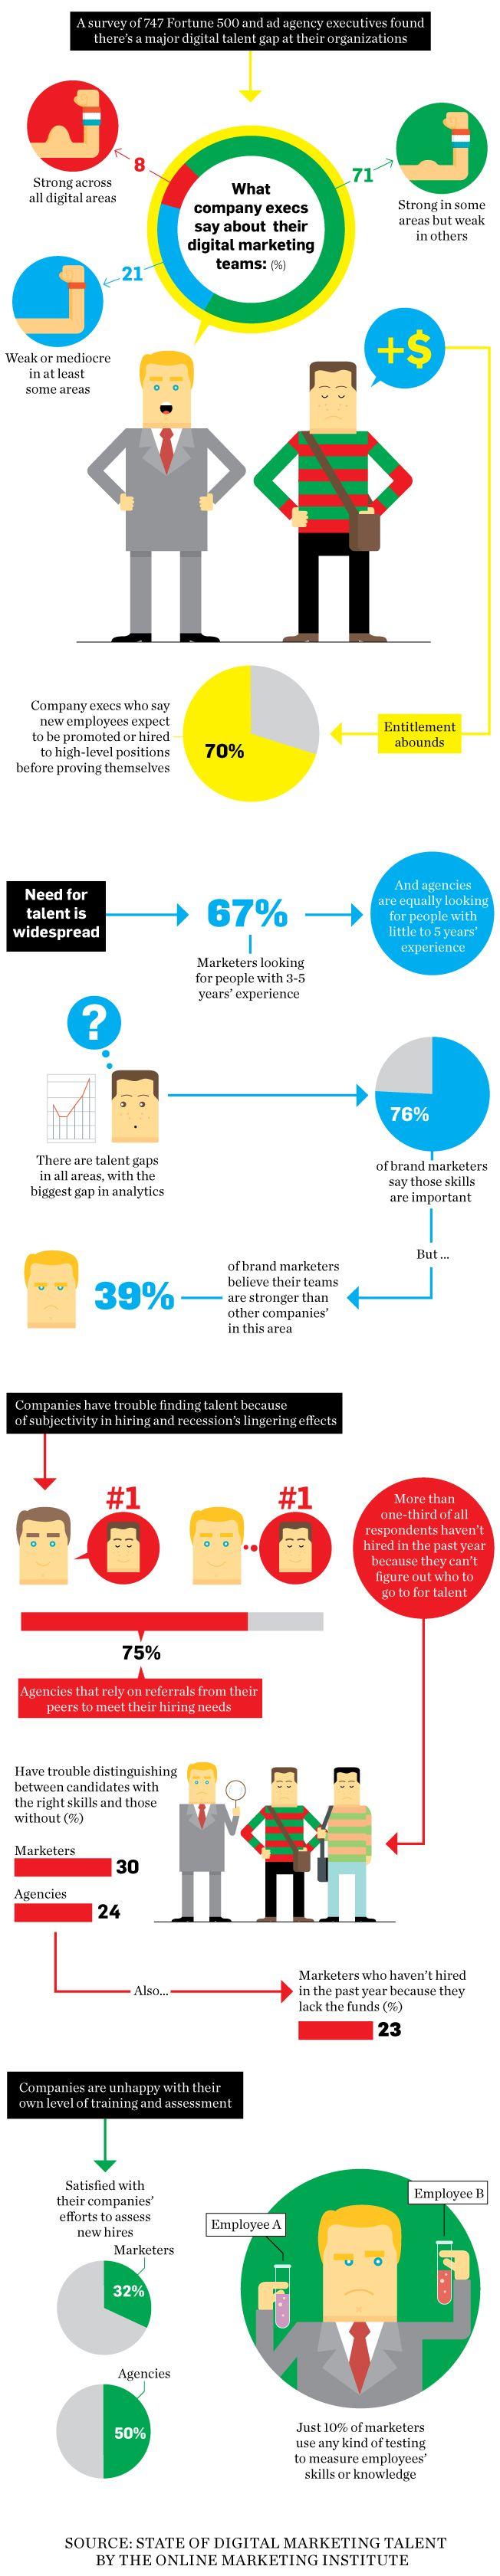 There Is a Digital Talent Gap | Adweek